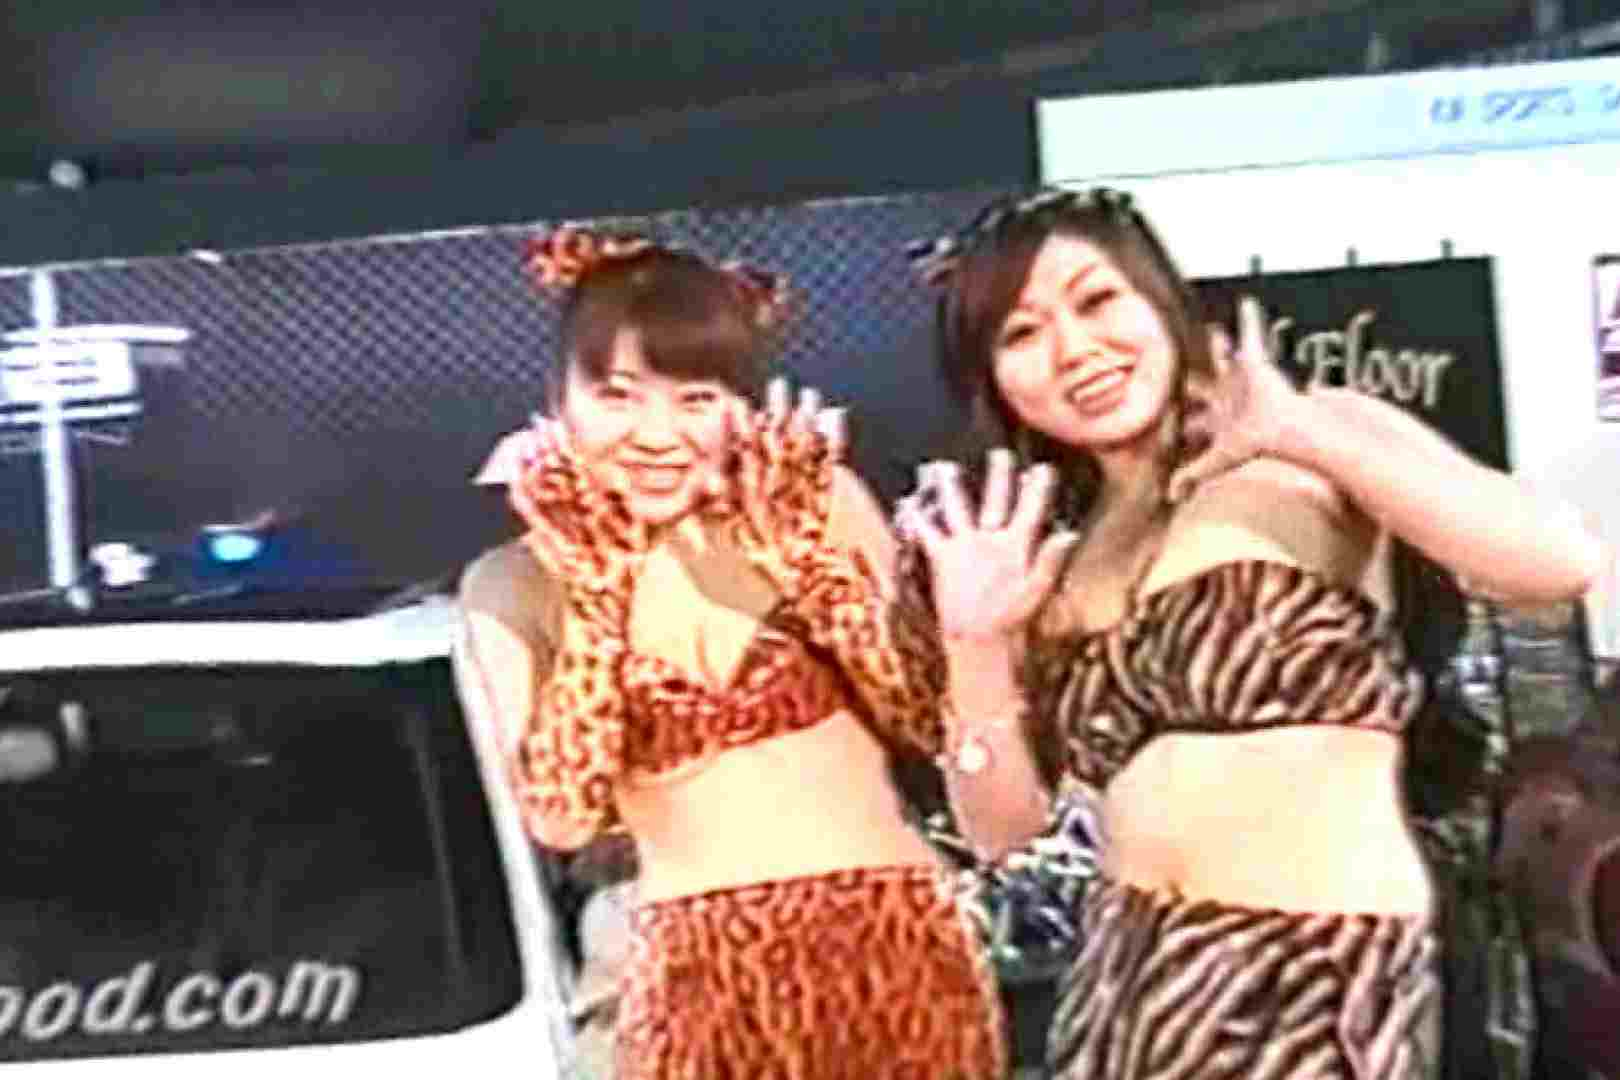 RQカメラ地獄Vol.23 卑猥 盗み撮り動画 106pic 39